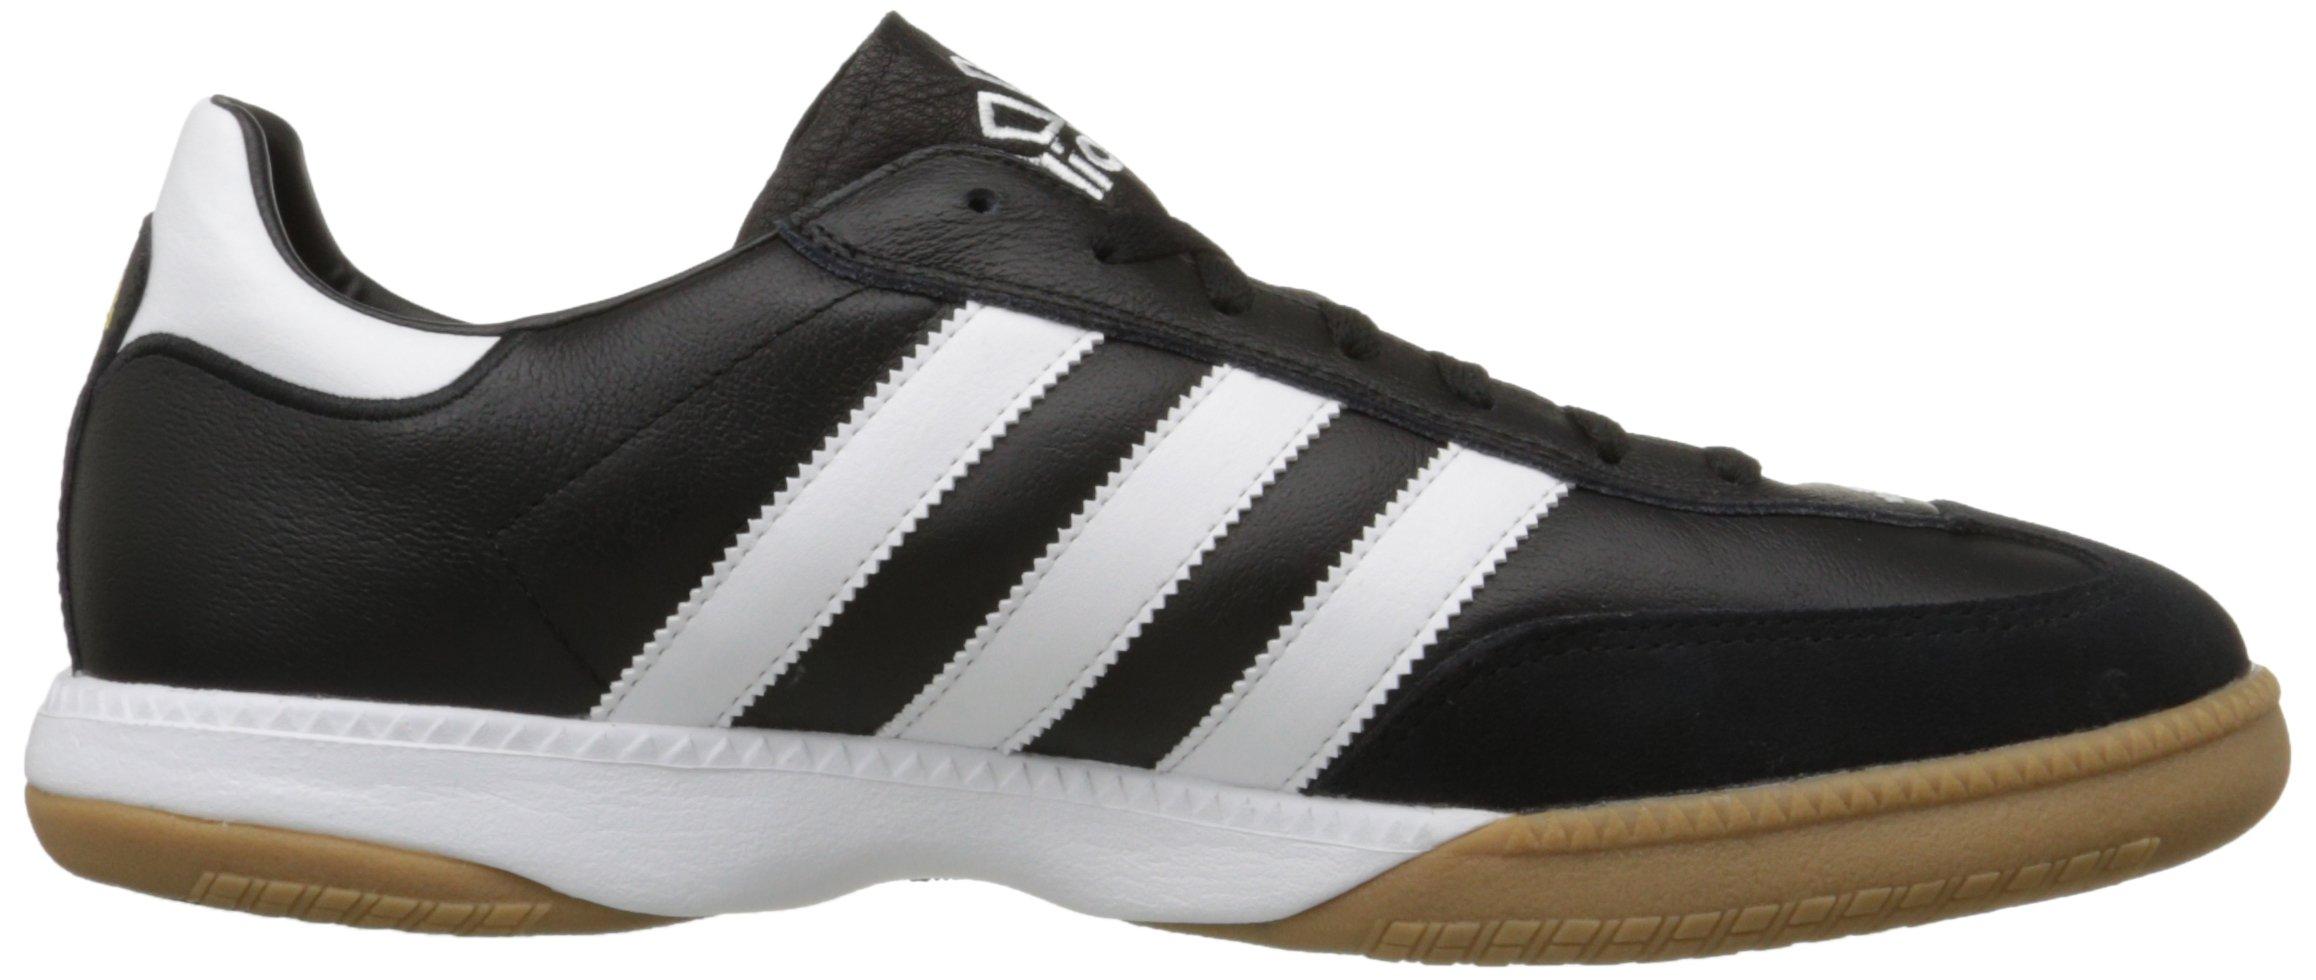 Adidas Samba Millennium Indoor Soccer Shoes Black White